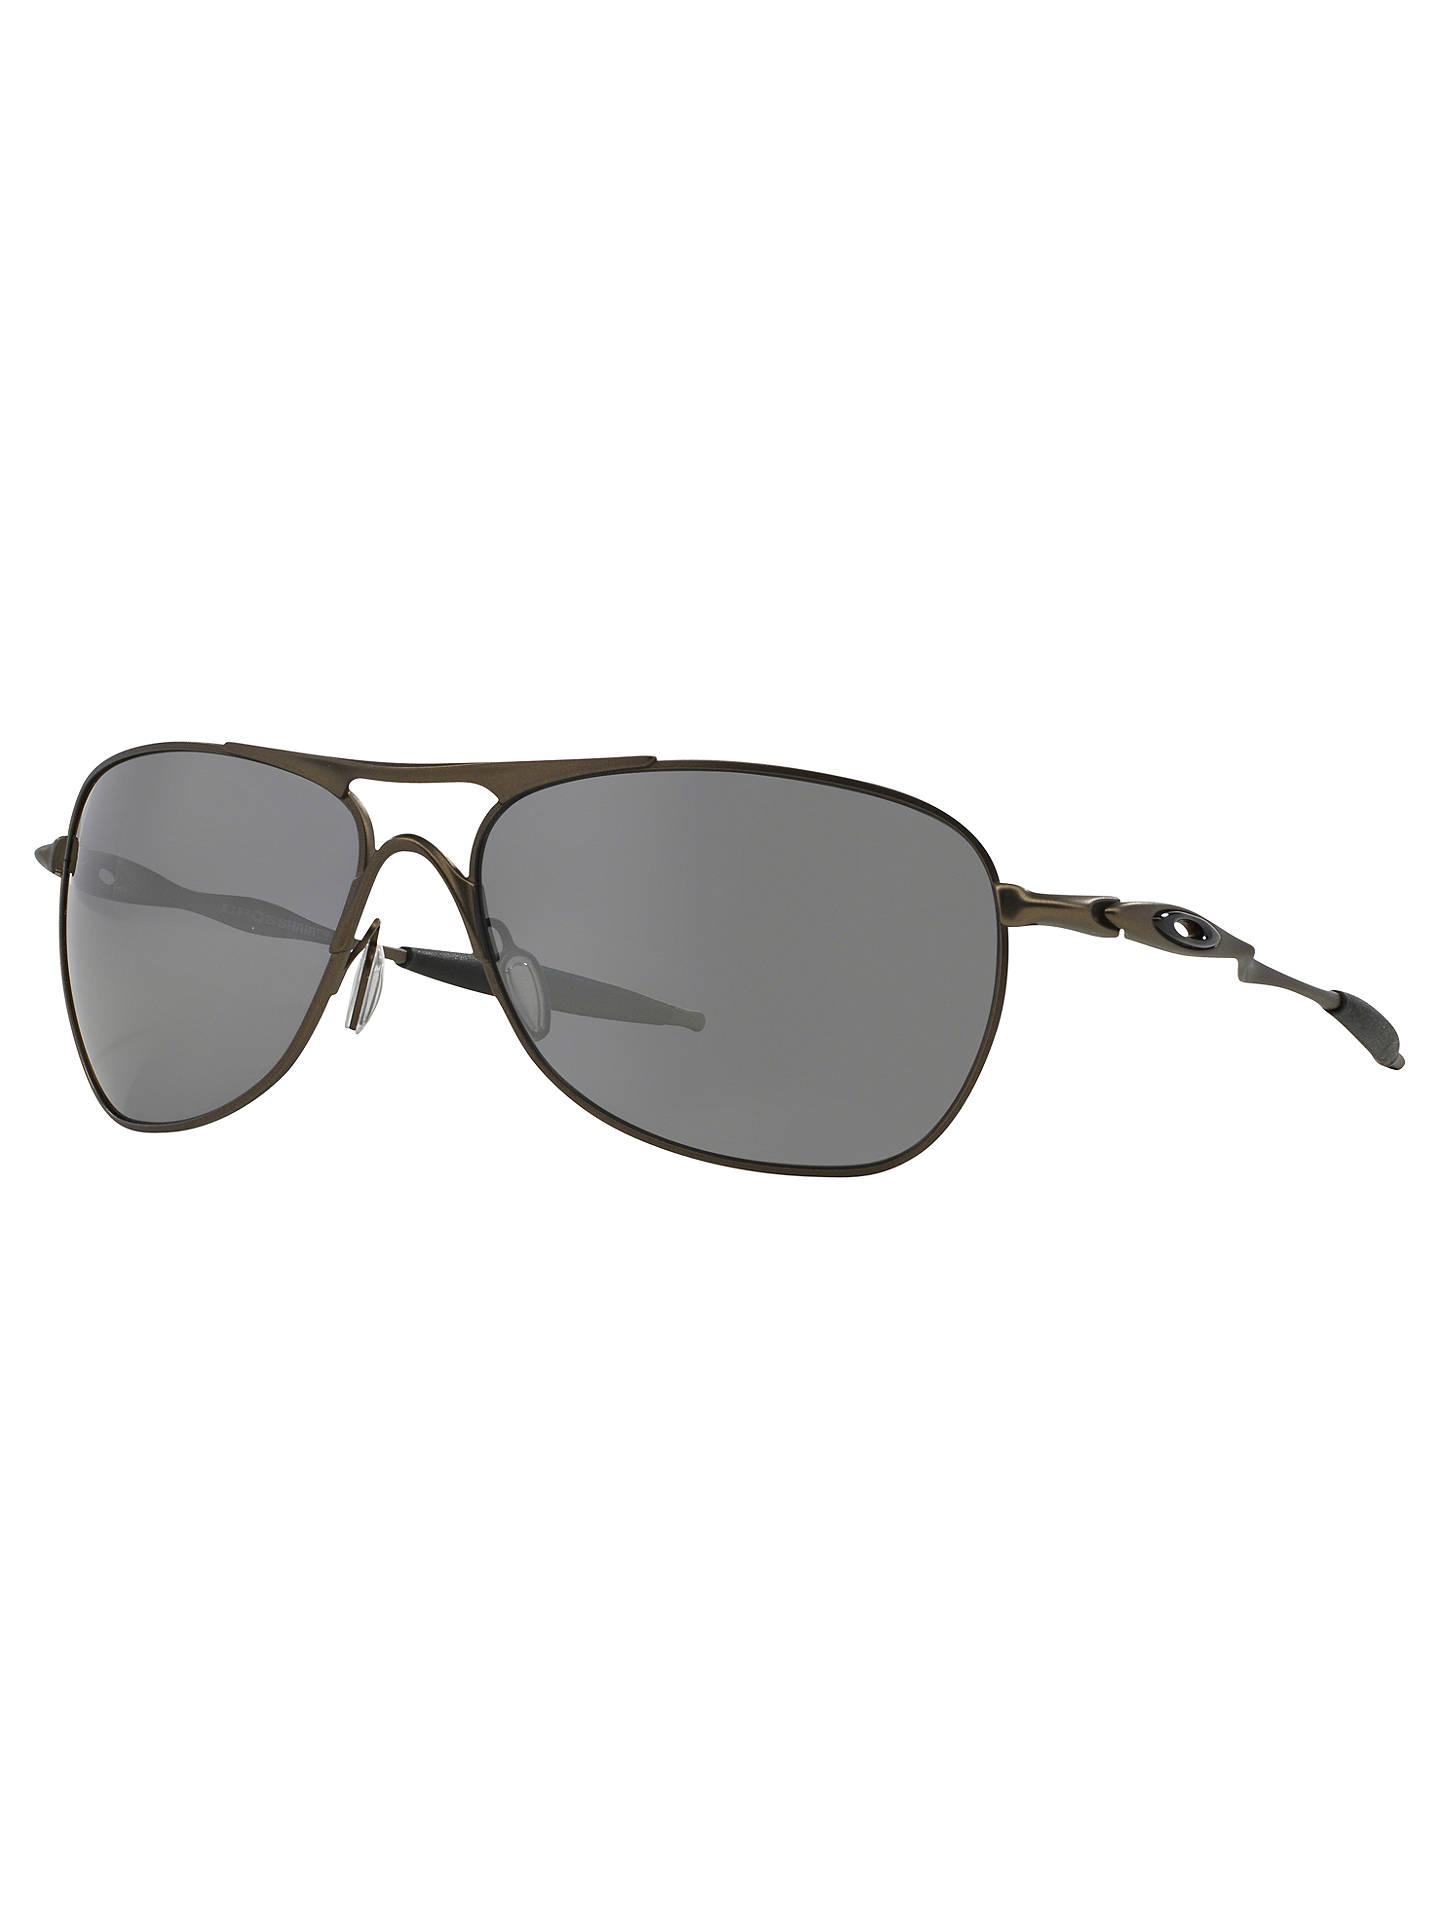 7d2659fa55b BuyOakley OO6014 Crosshair Polarised Aviator Frame Sunglasses